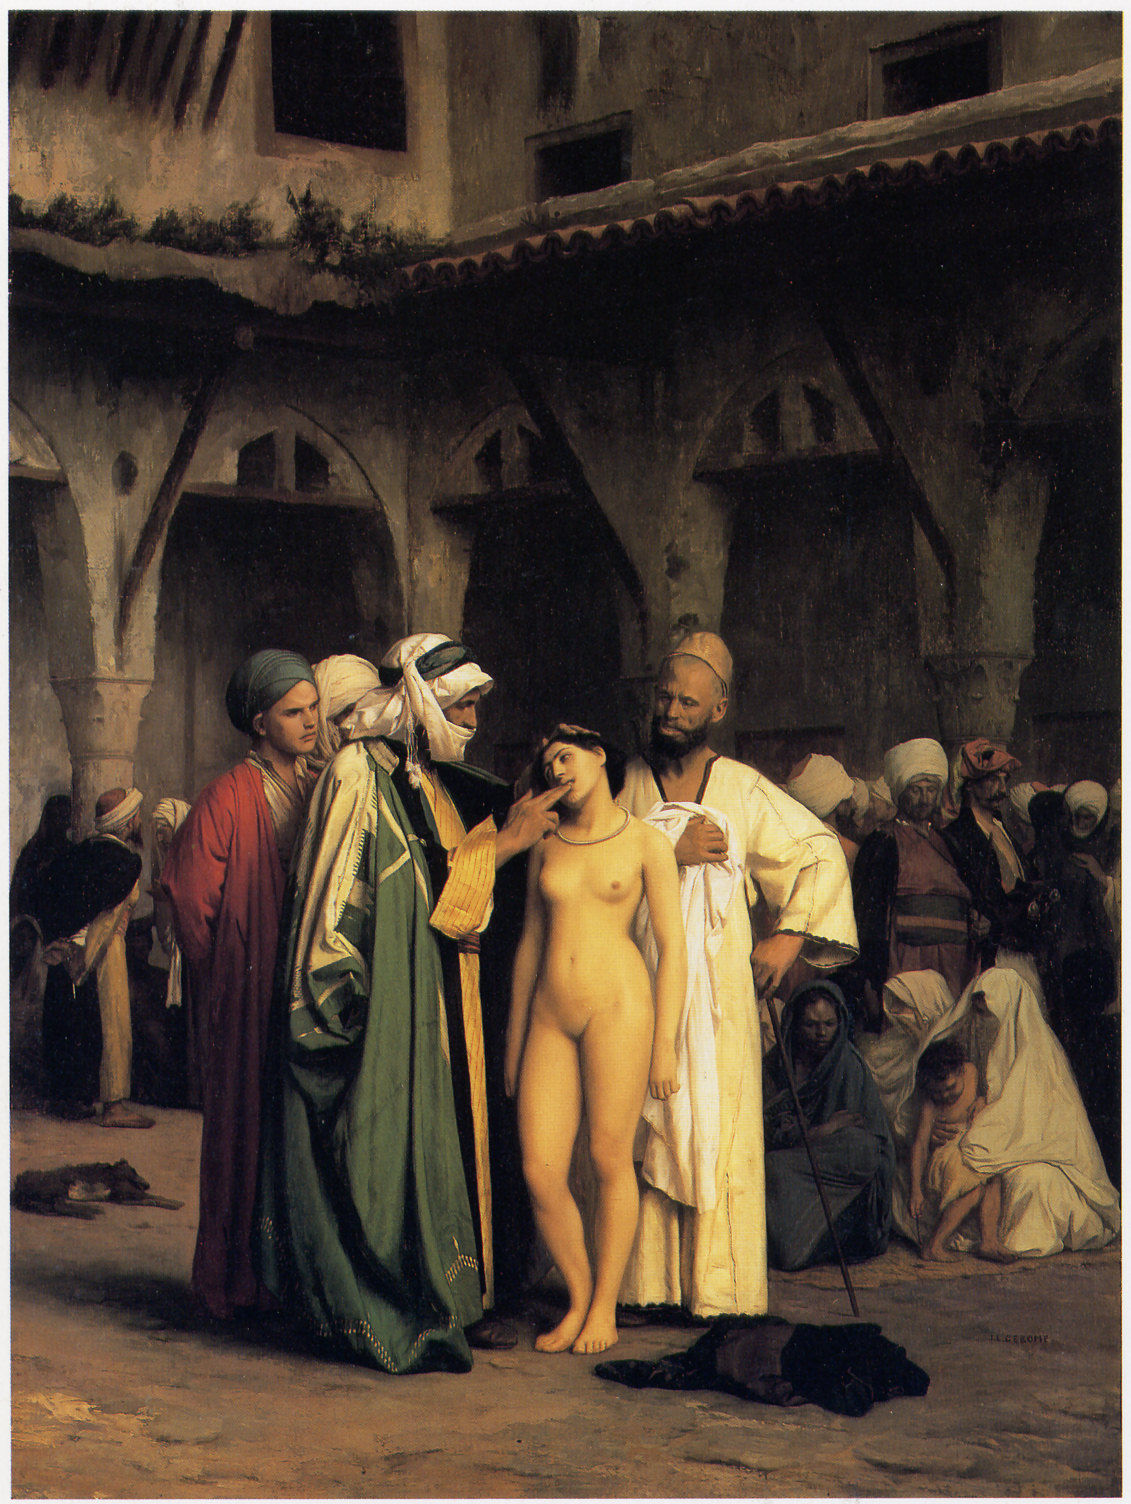 El mercado de esclavos. Jean-Léon Gérôme. Óleo sobre lienzo, 1866